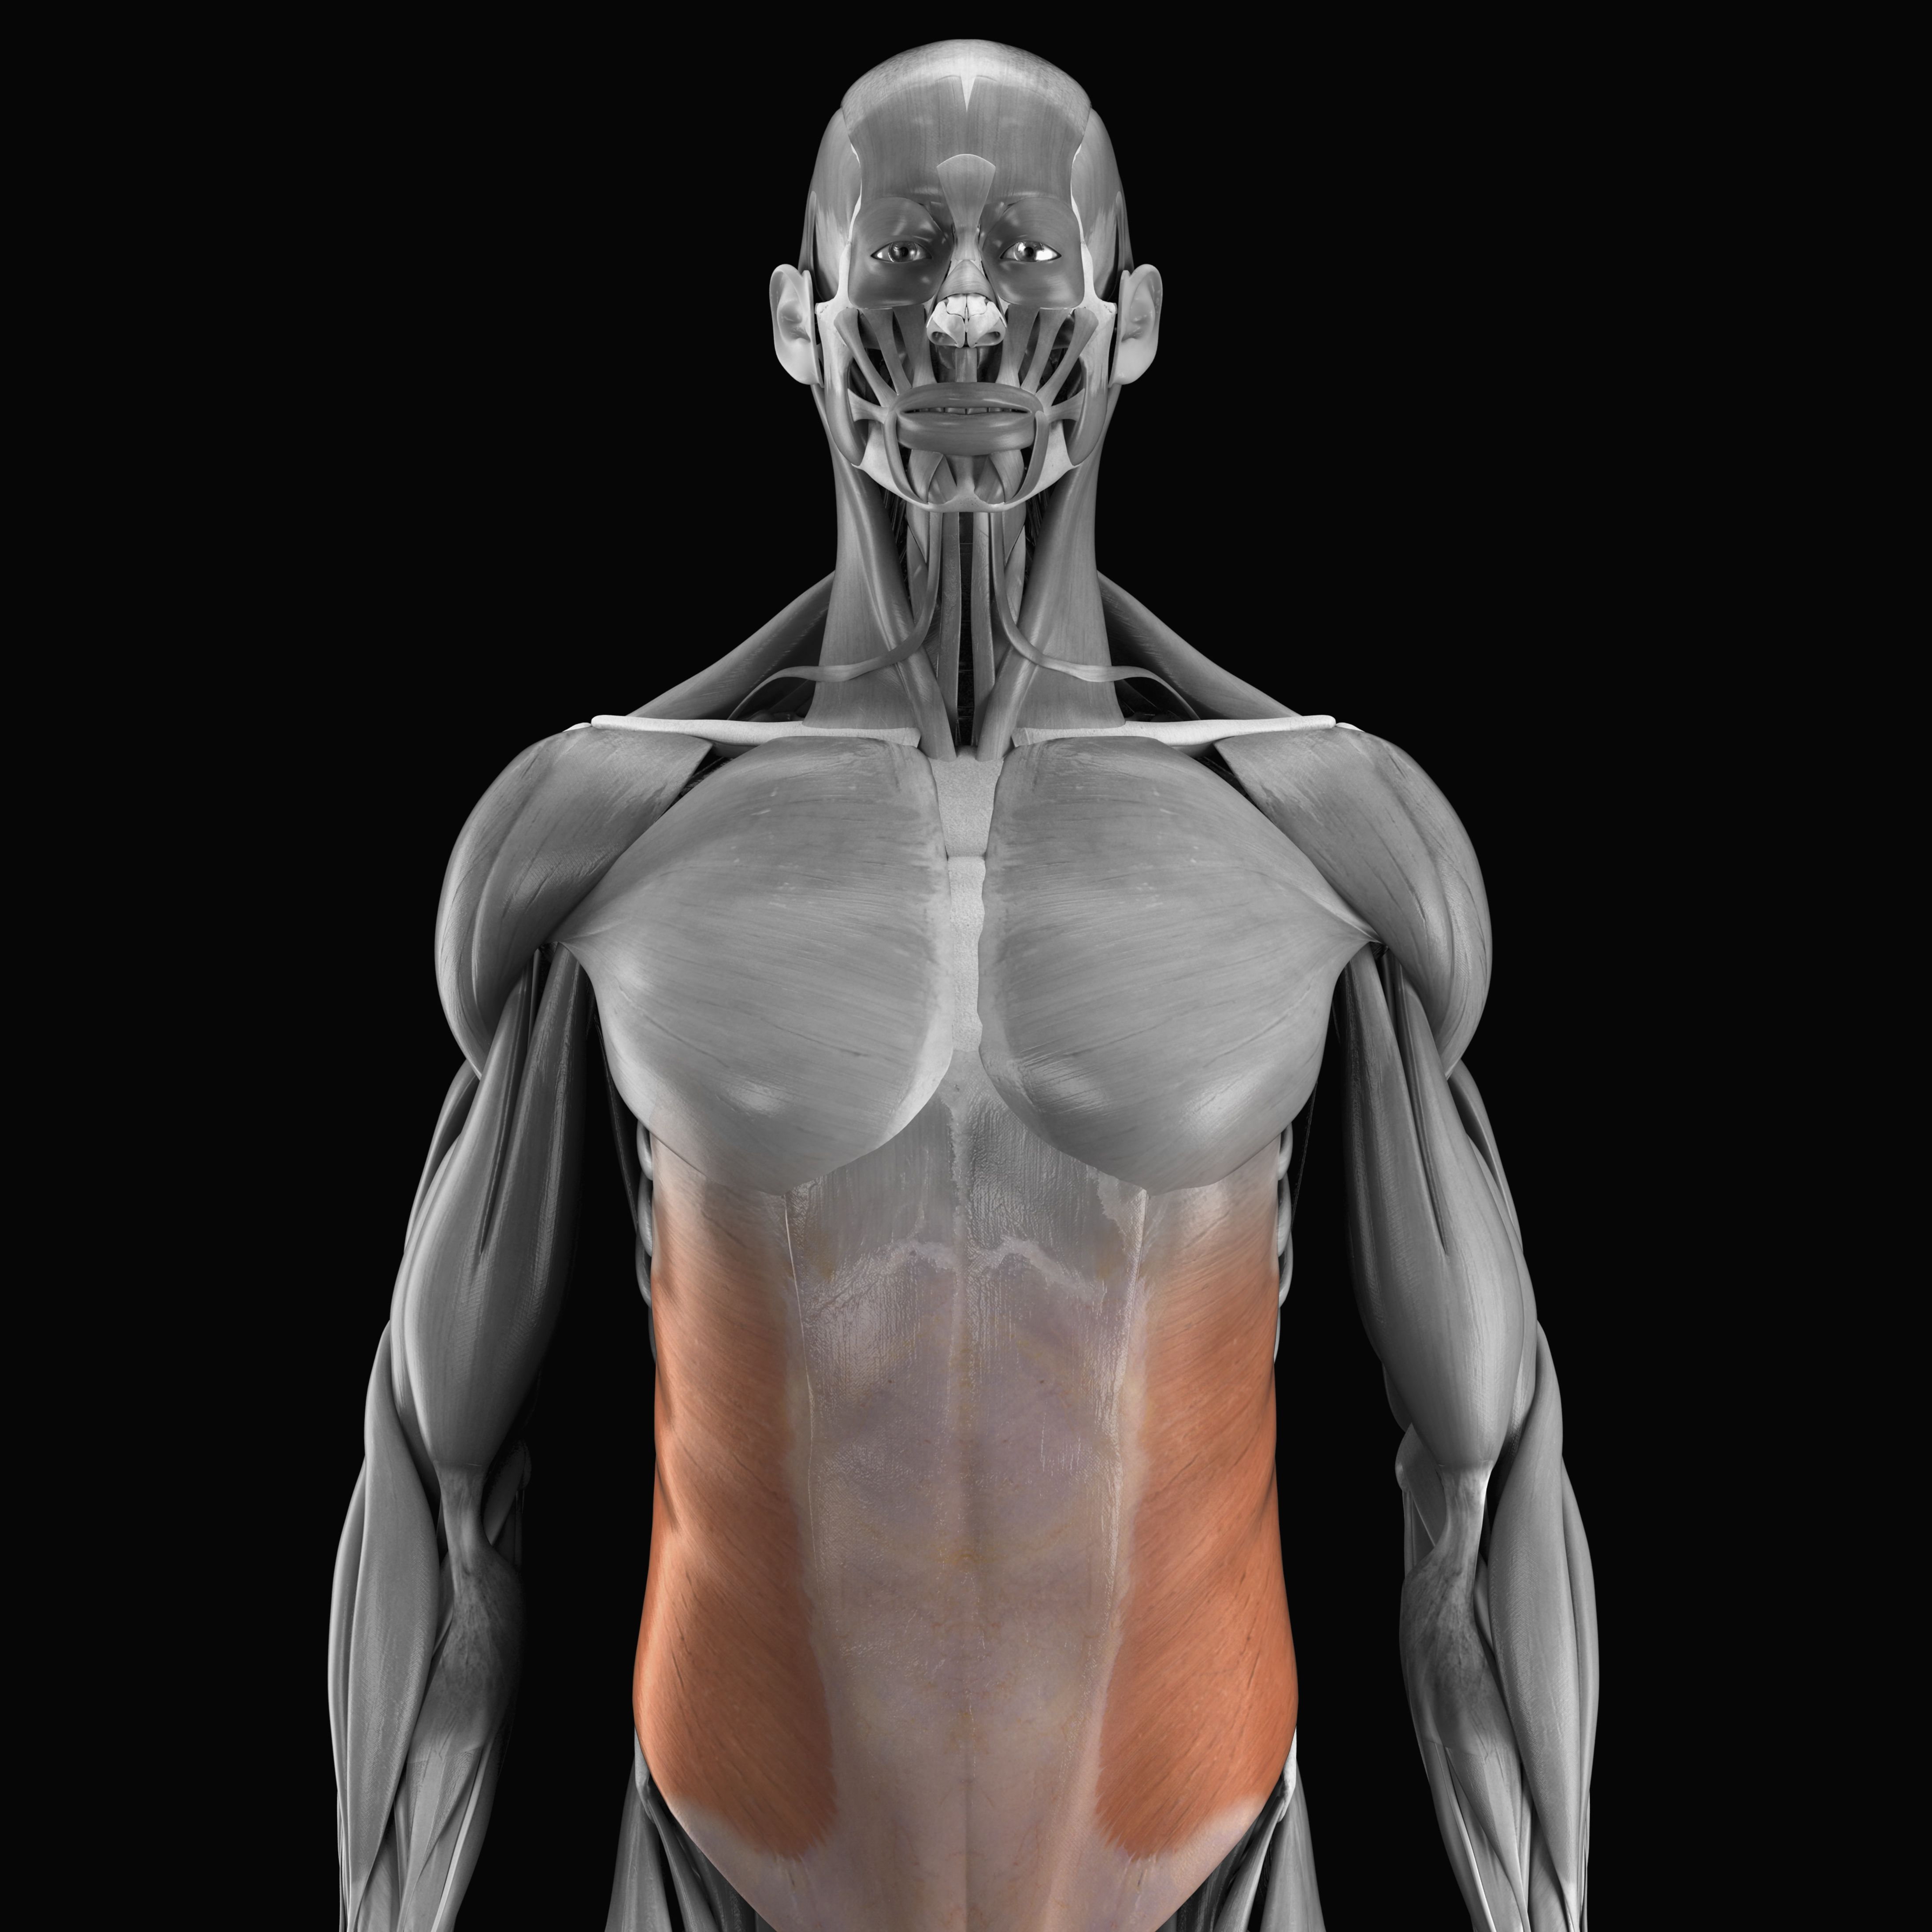 Músculos oblicuos externos e internos